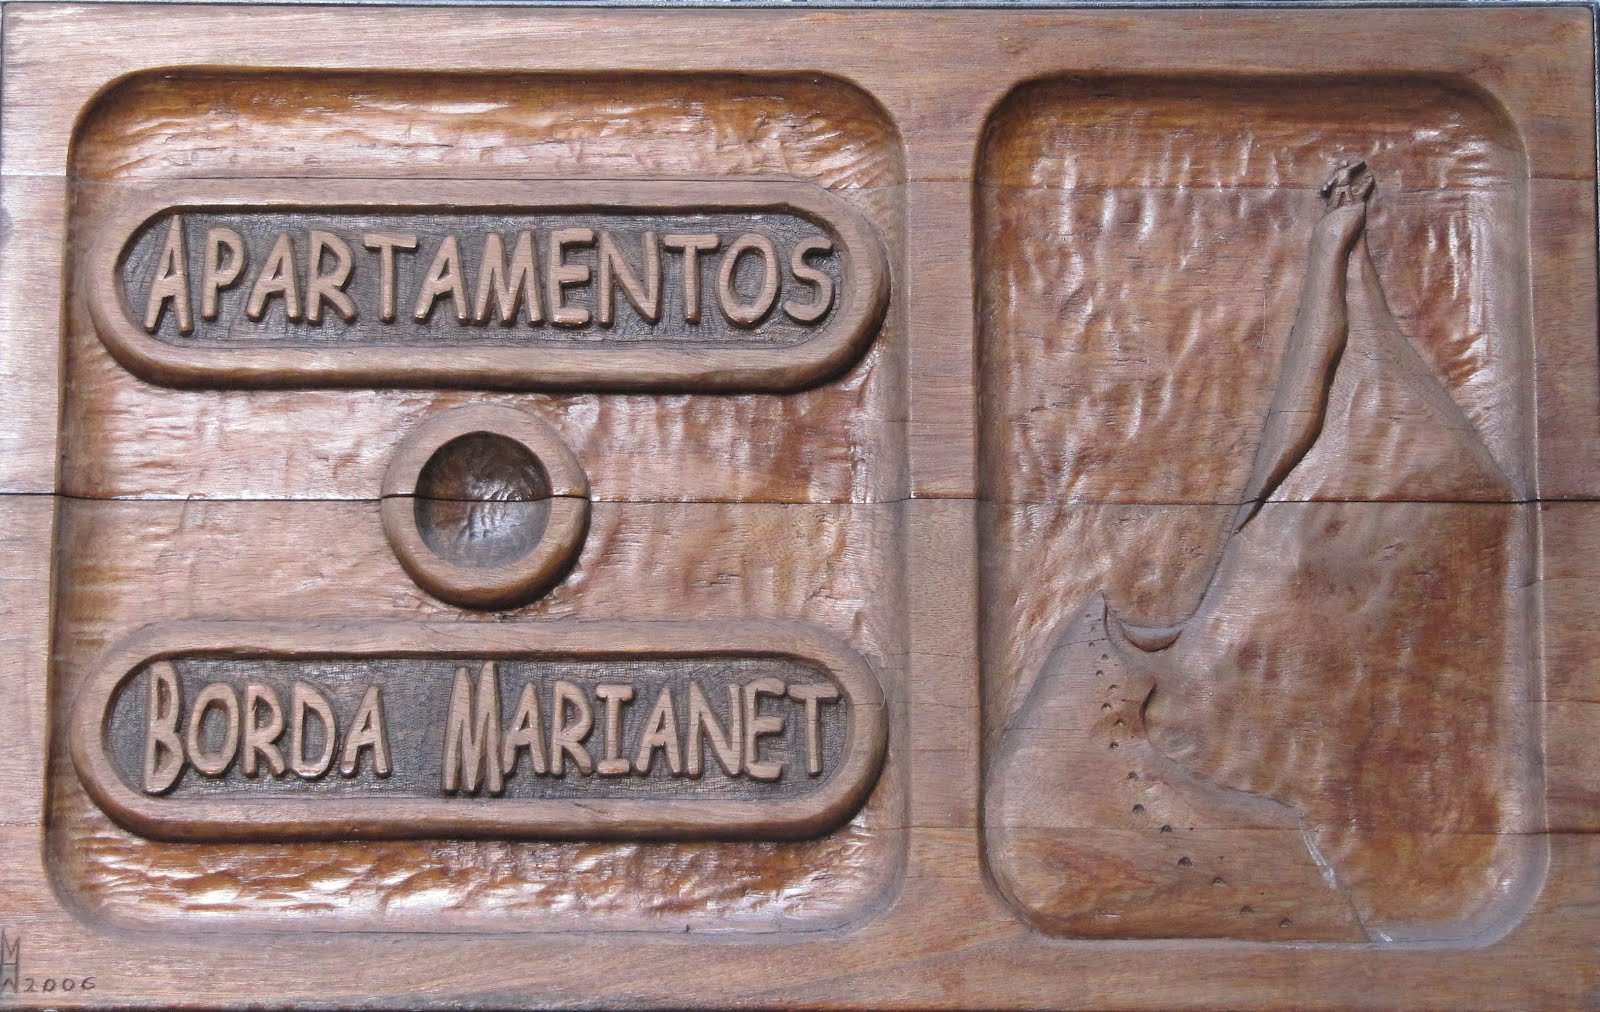 BORDA MARIANET